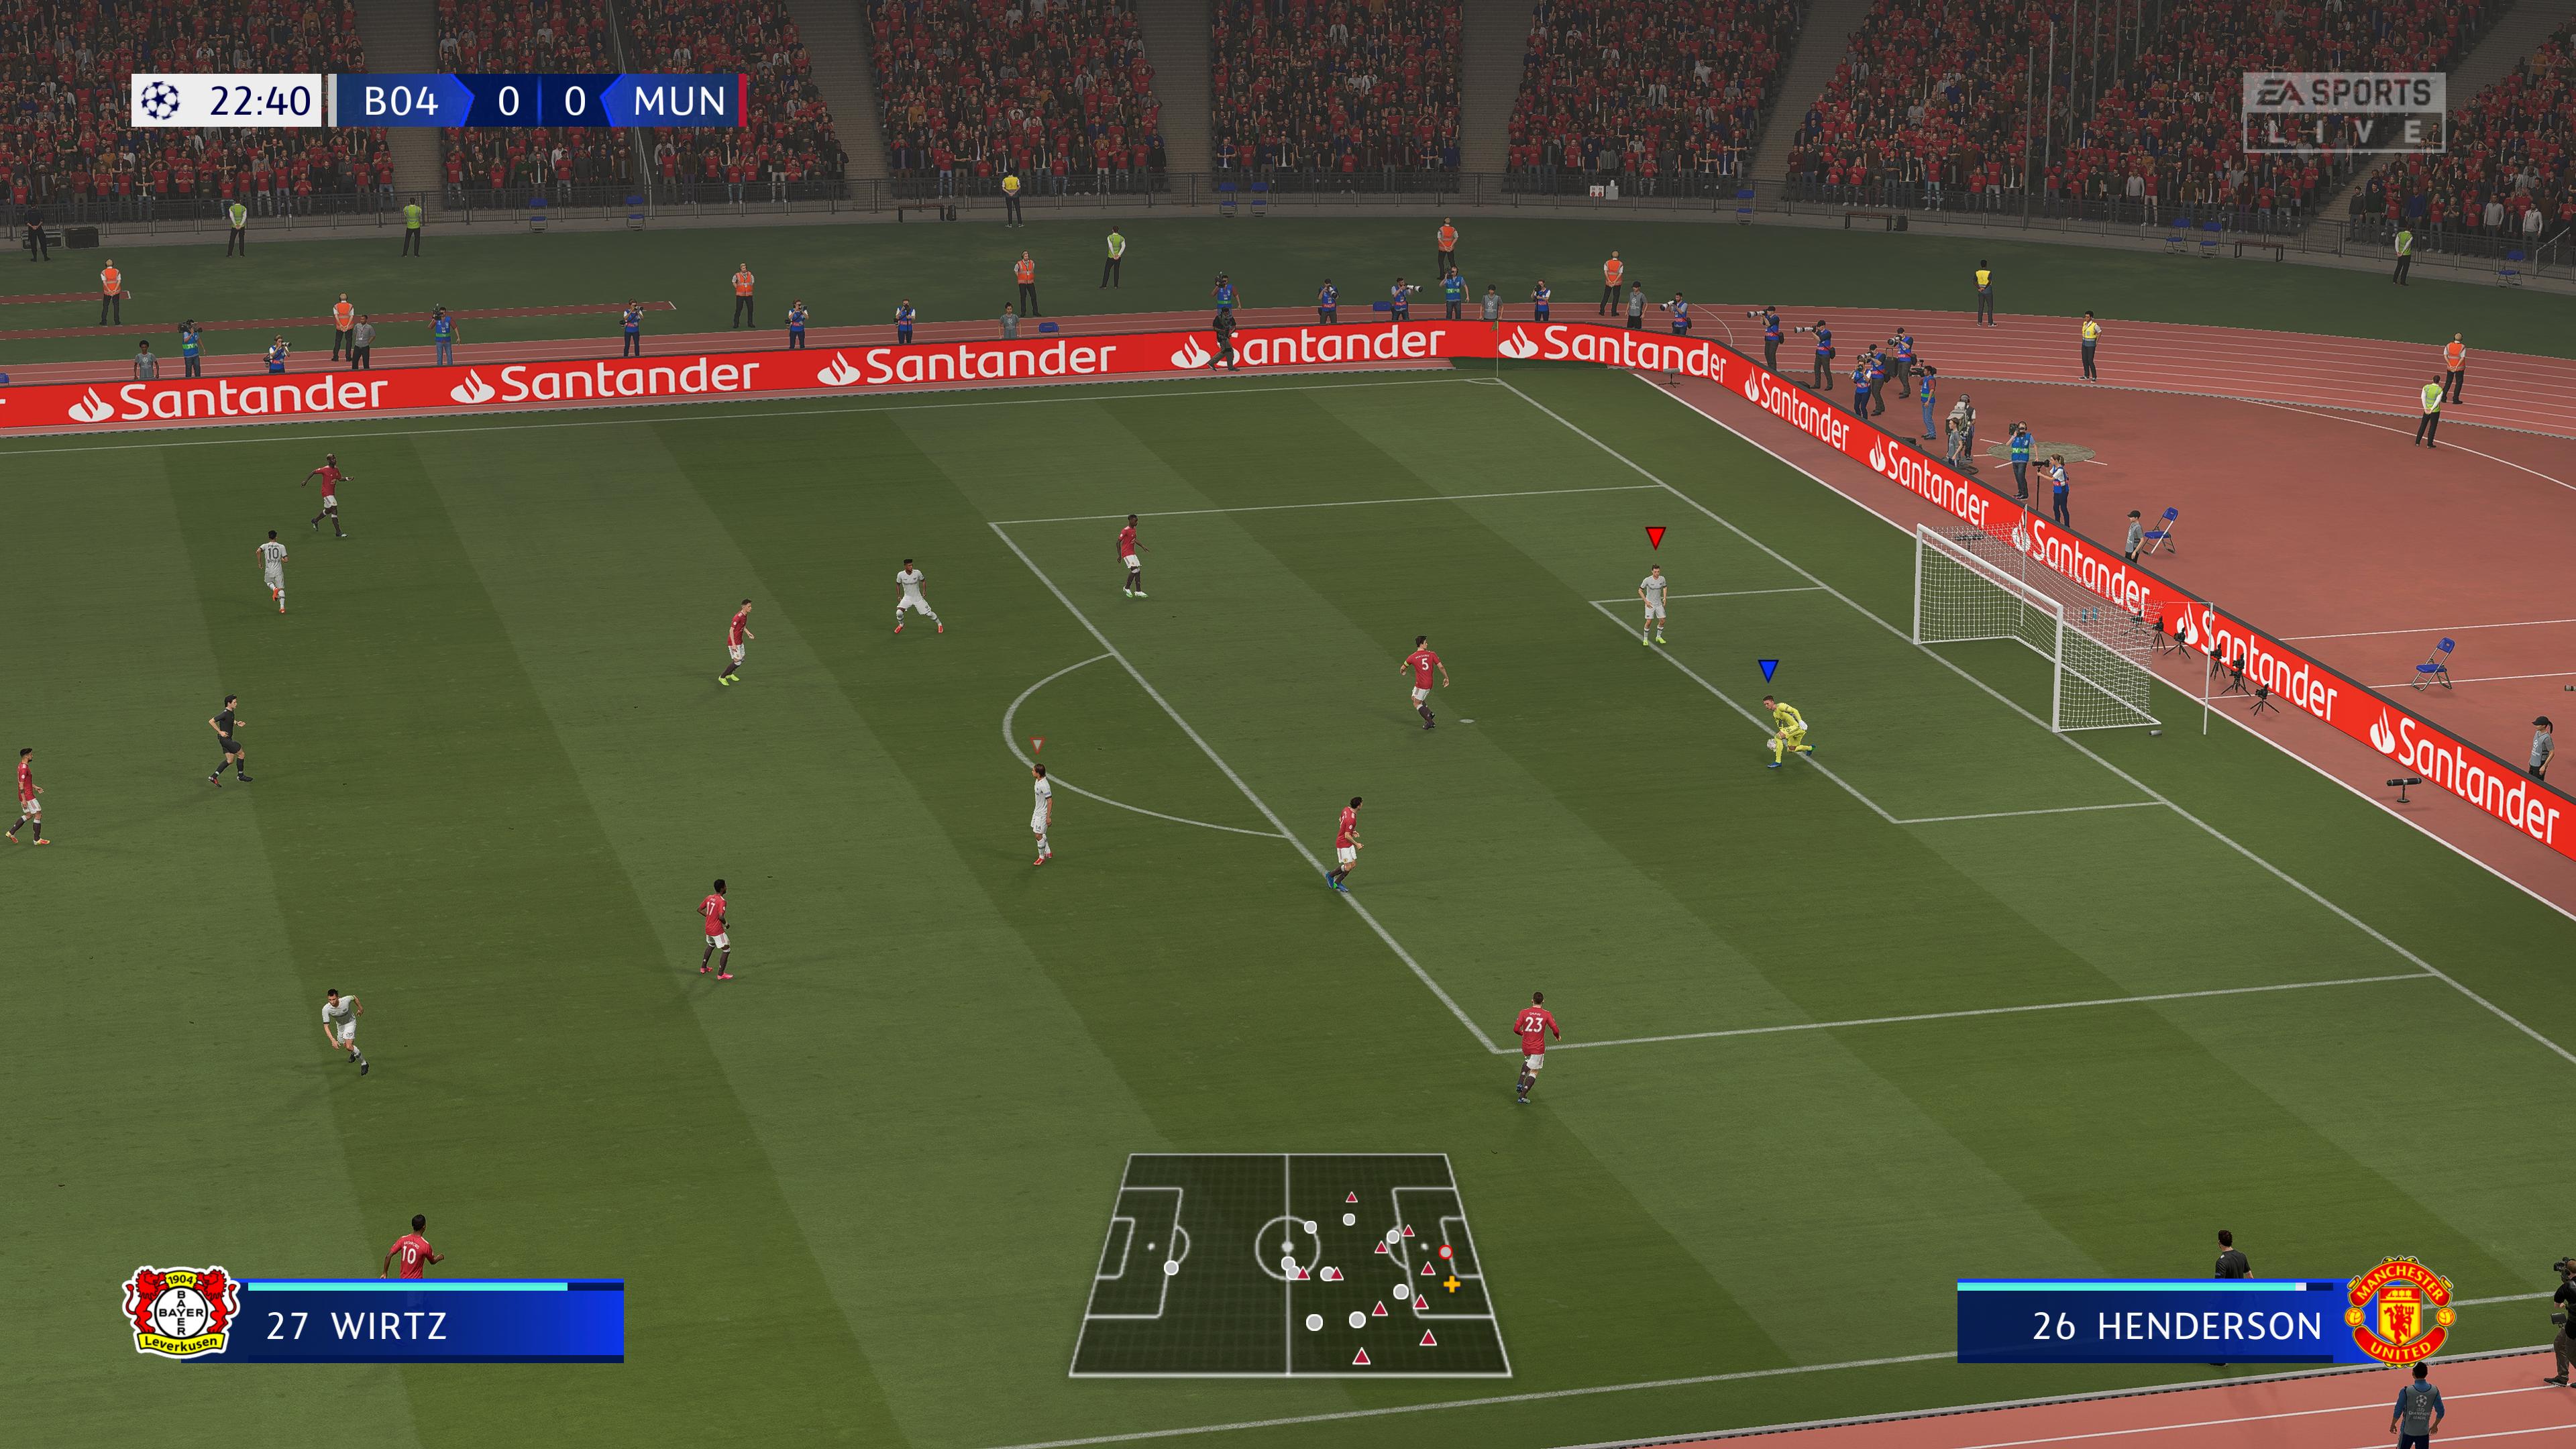 Nawet niepozorna FIFA zyskuje blasku na PlayStation 5